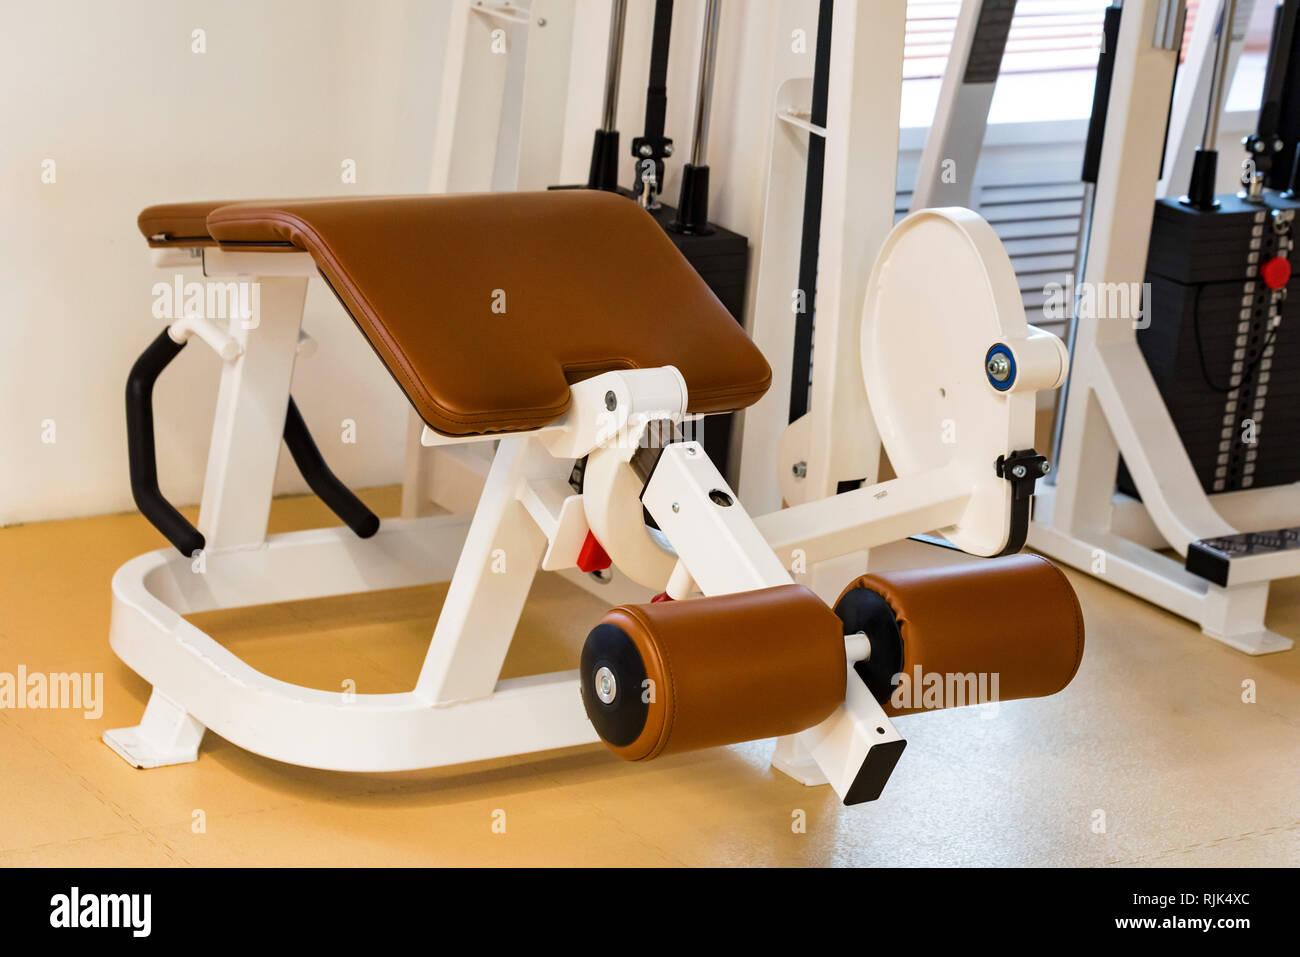 Ment vide courbe jambe machine d'exercice dans une salle de sport moderne Photo Stock